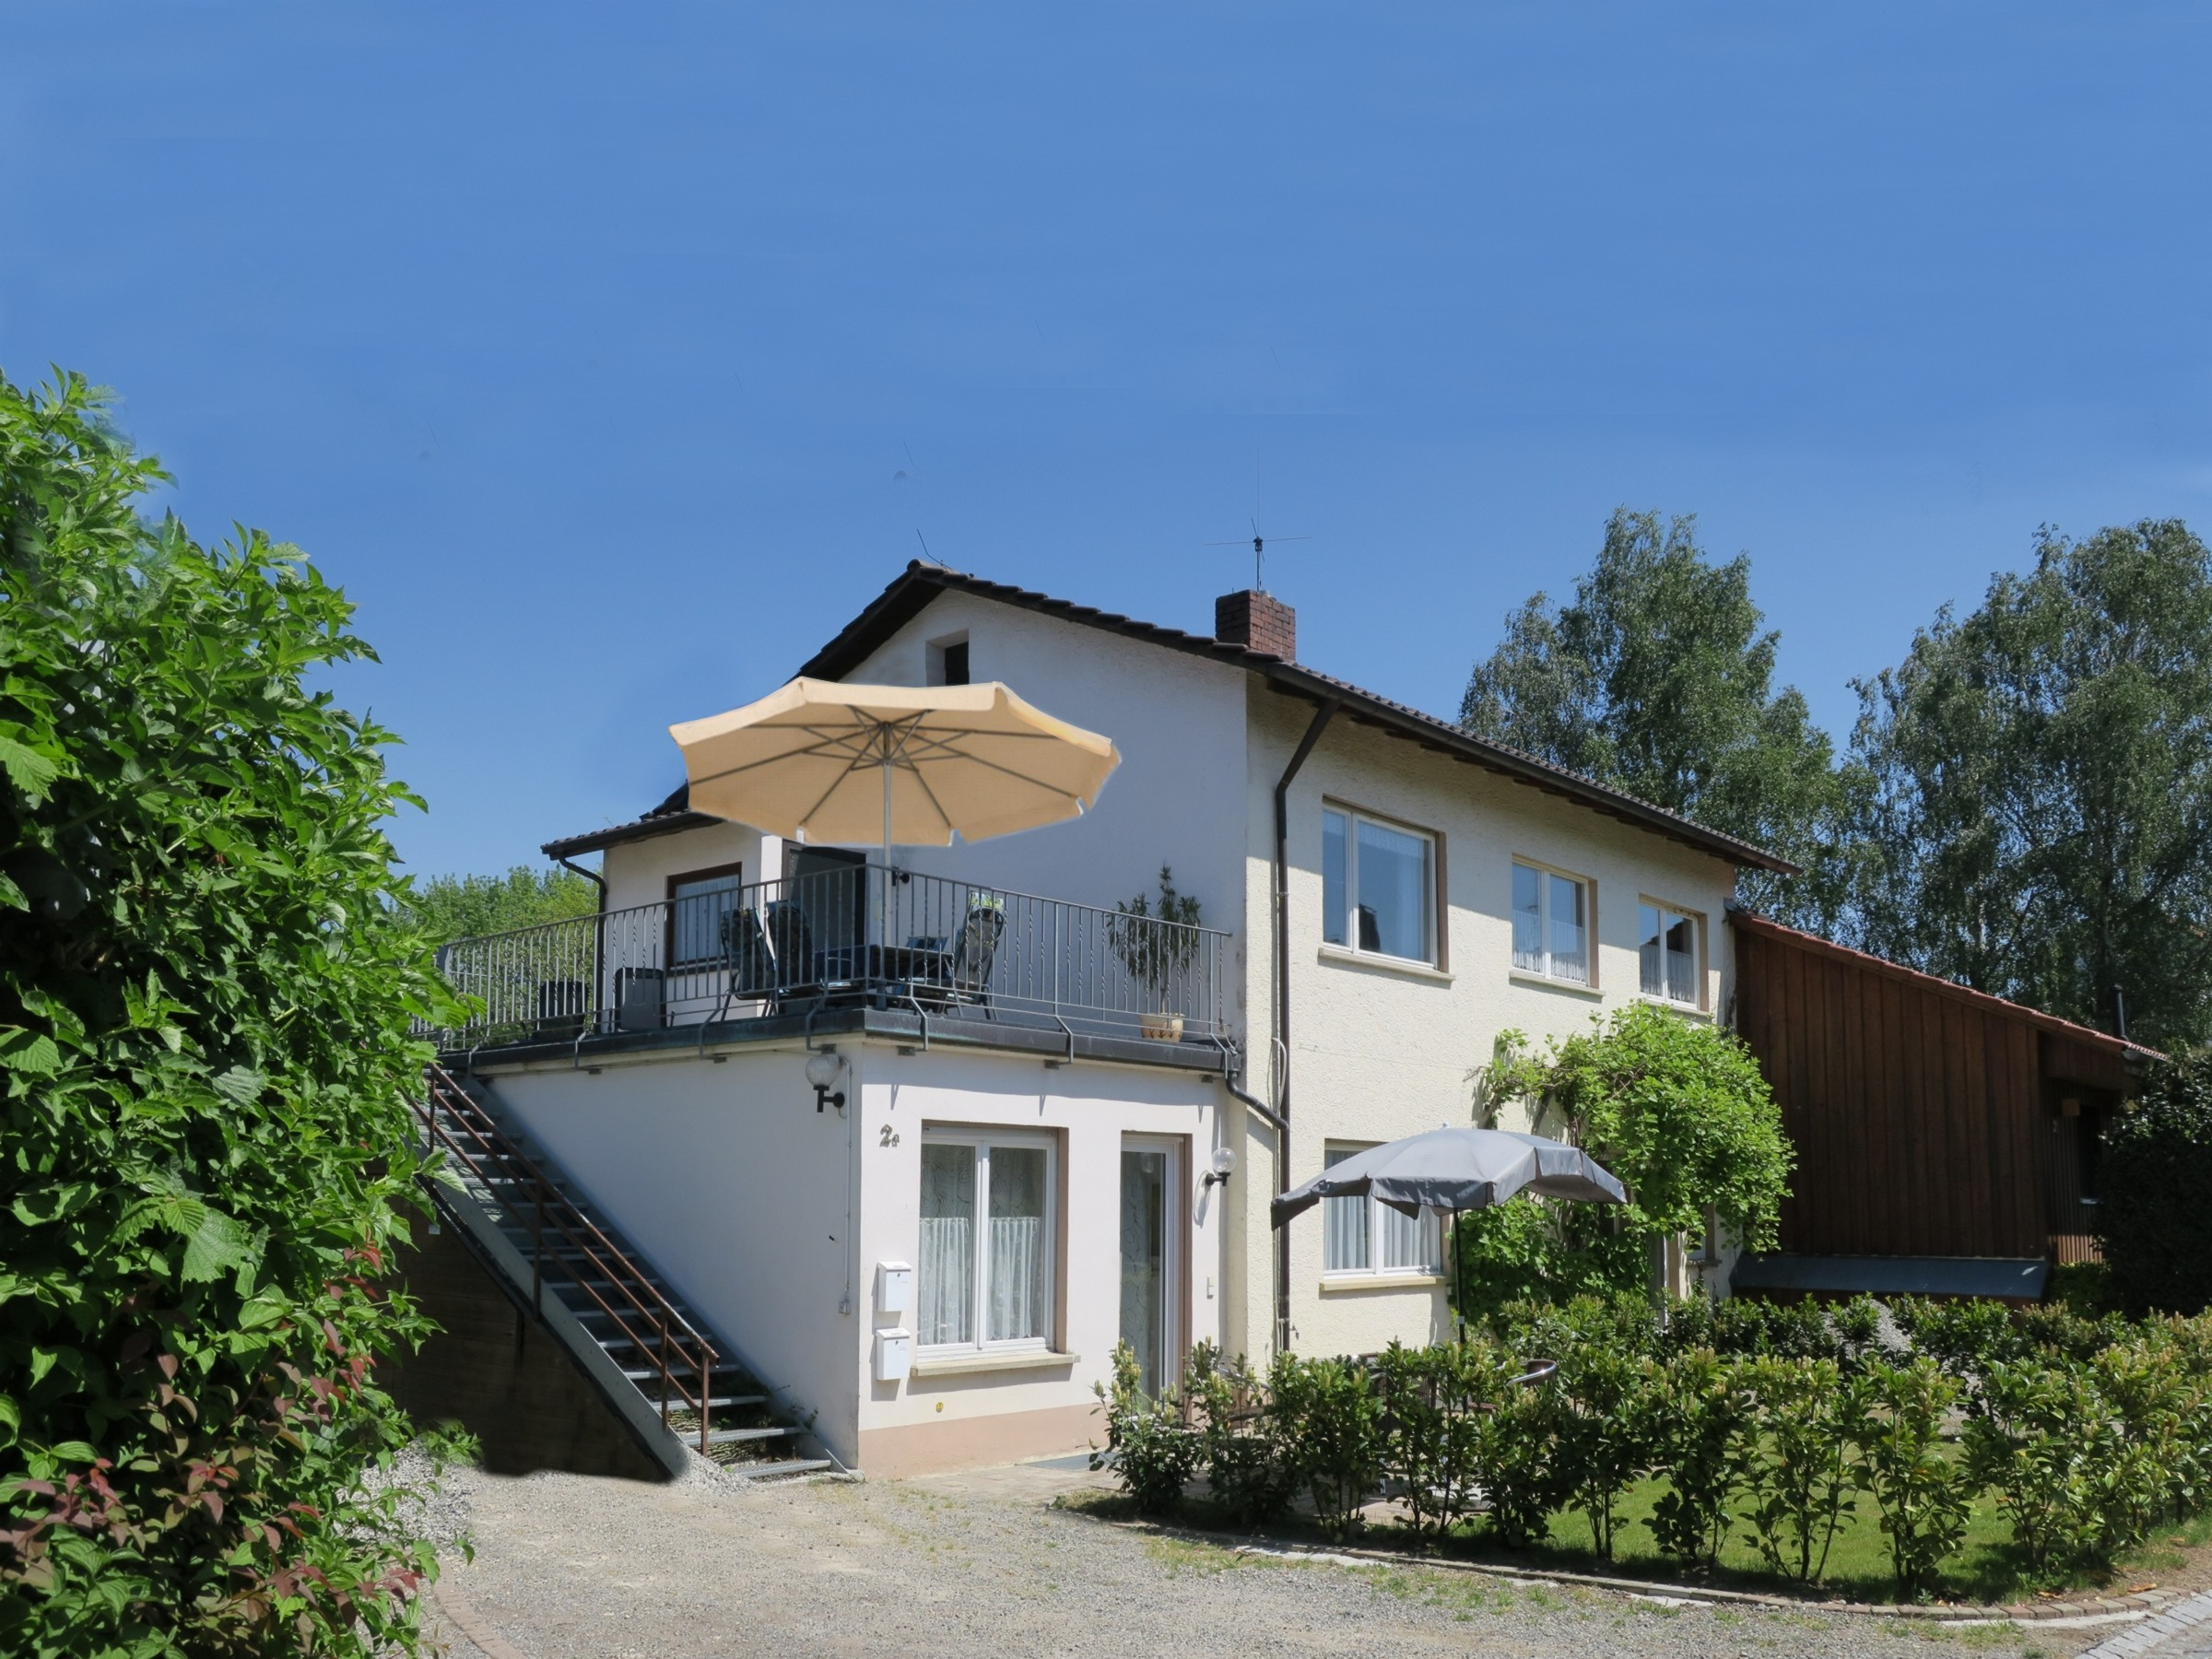 Atelier Probst- Haus Hornwiesenstraße 2, (Ko